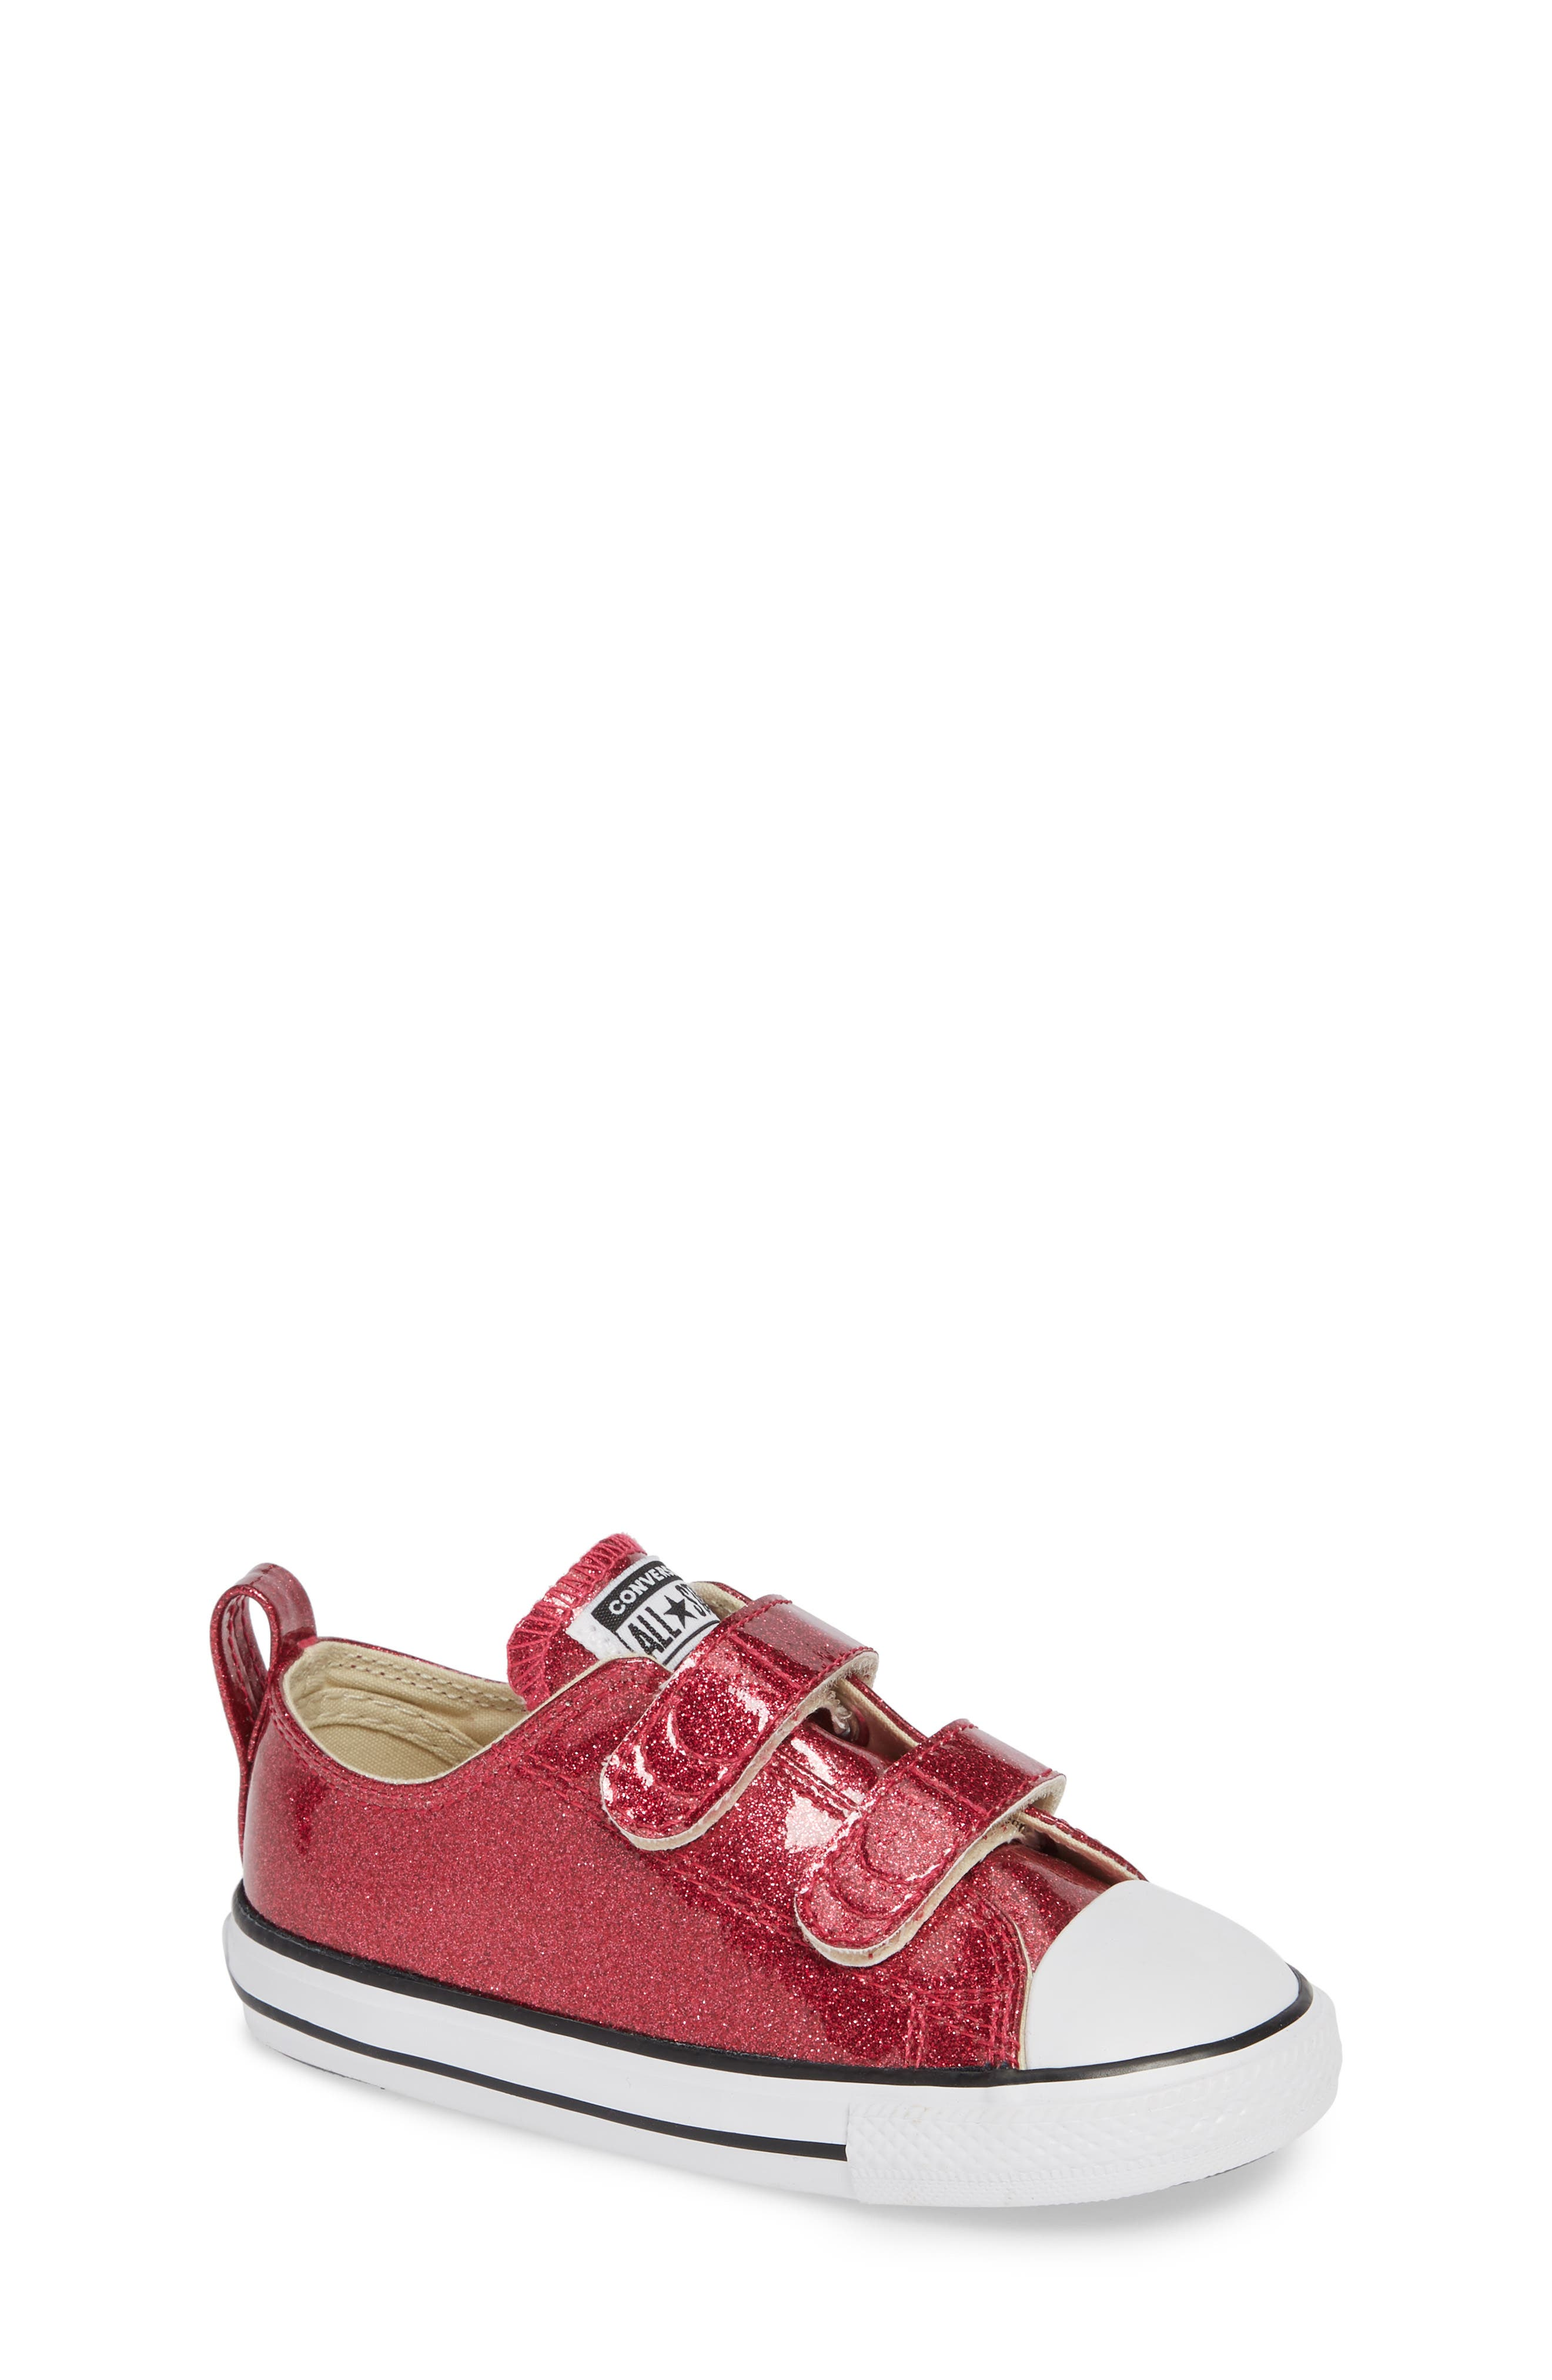 All Star<sup>®</sup> Seasonal Glitter Sneaker,                             Main thumbnail 1, color,                             Pink Pop